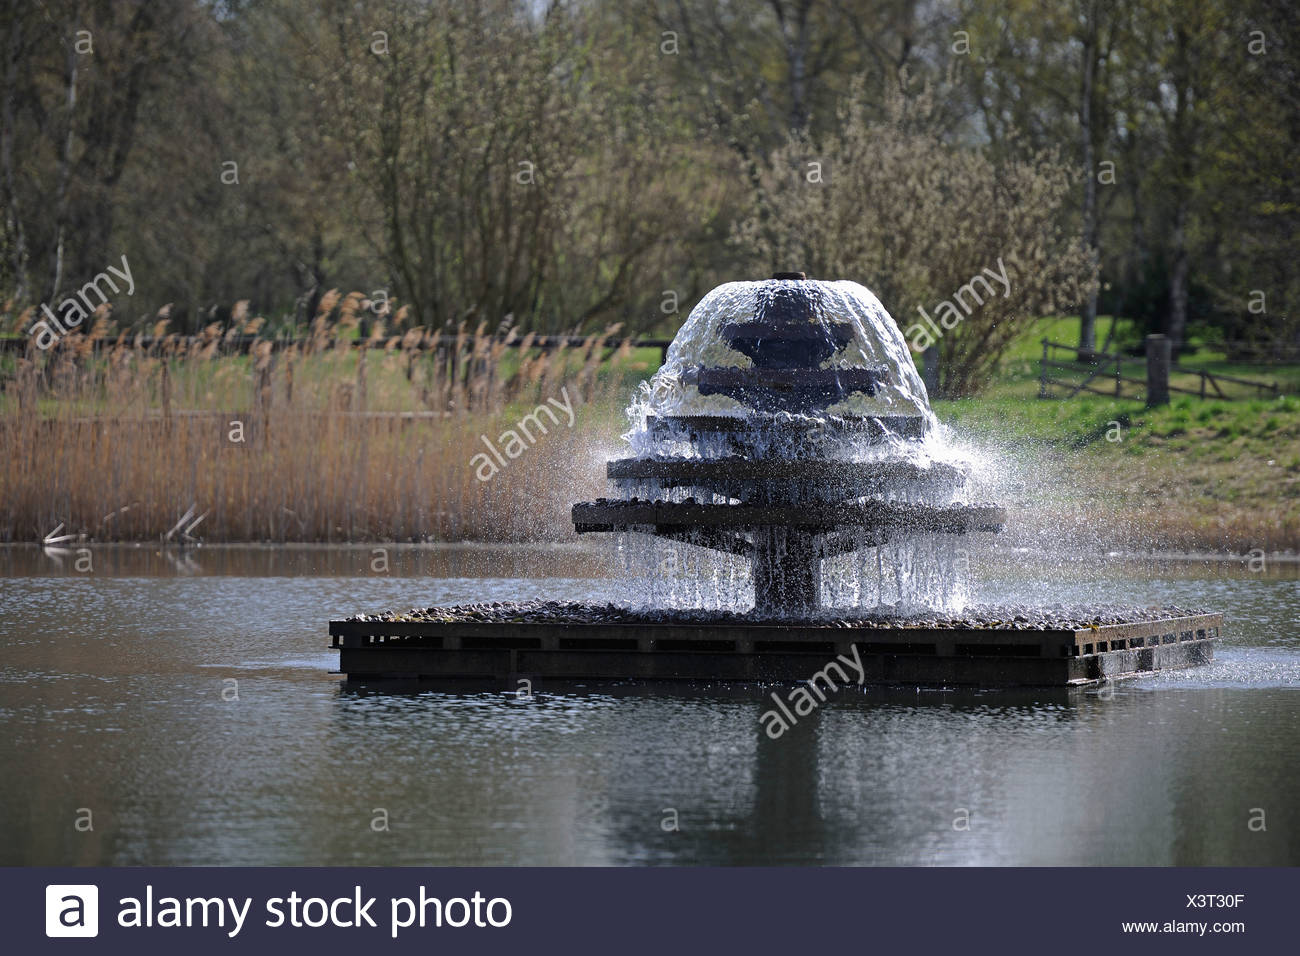 Fountain in a pond, Britzer Garten park, Berlin, Germany, Europe - Stock Image